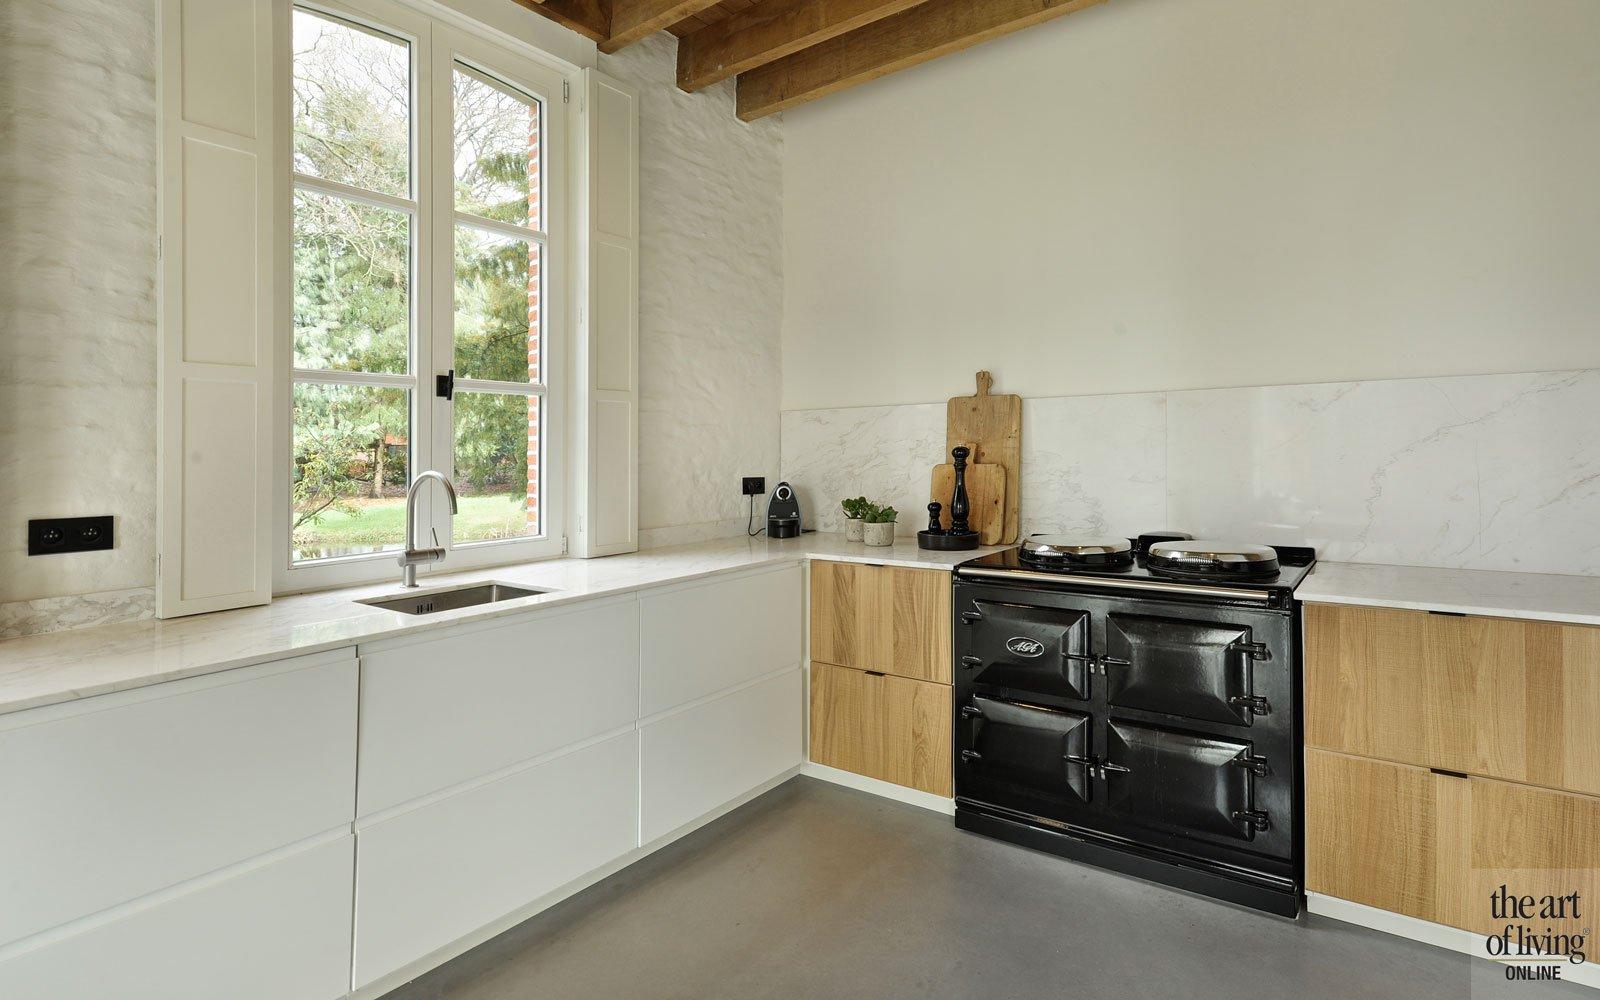 Leefkeuken, AGA-fornuis, licht, keuken, natuursteen keukenblad, oud koetshuis, Michiel van Raemsdonck